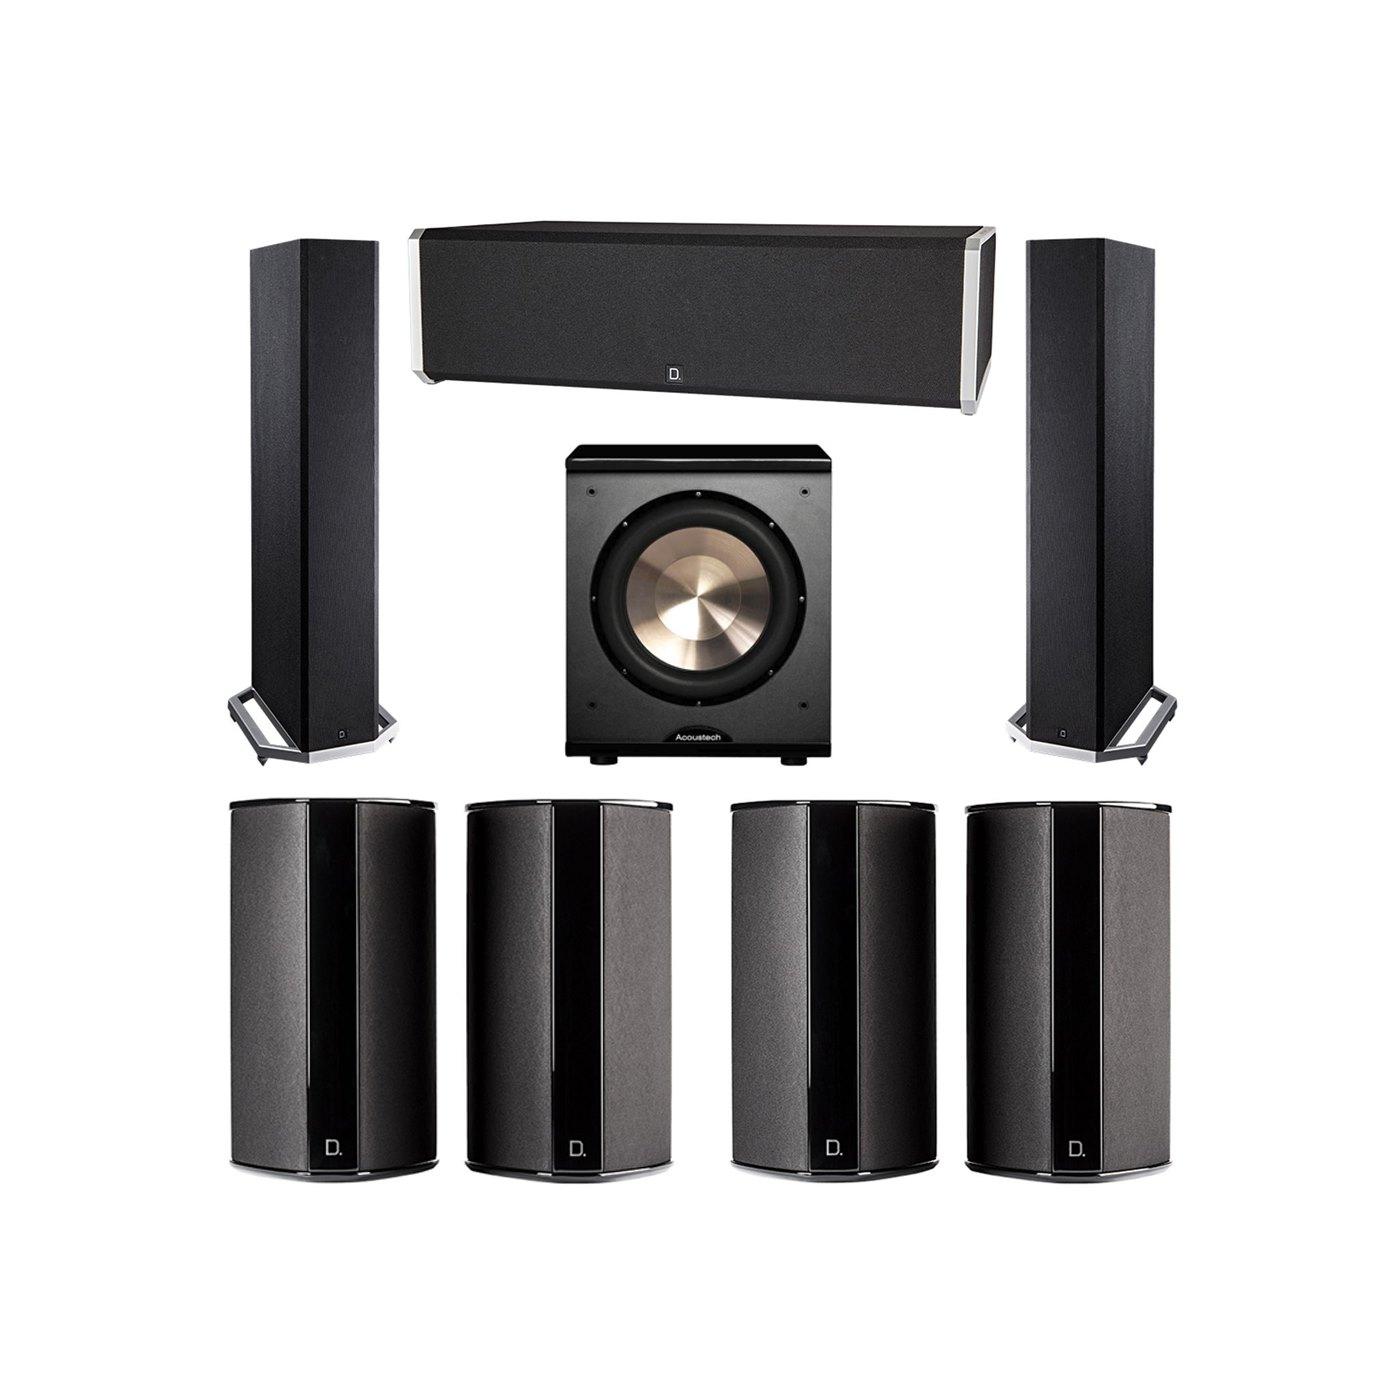 Definitive Technology 7.1 System with 2 BP9020 Tower Speakers, 1 CS9040 Center Channel Speaker, 4 SR9080 Surround Speaker, 1 BIC PL-200 Subwoofer